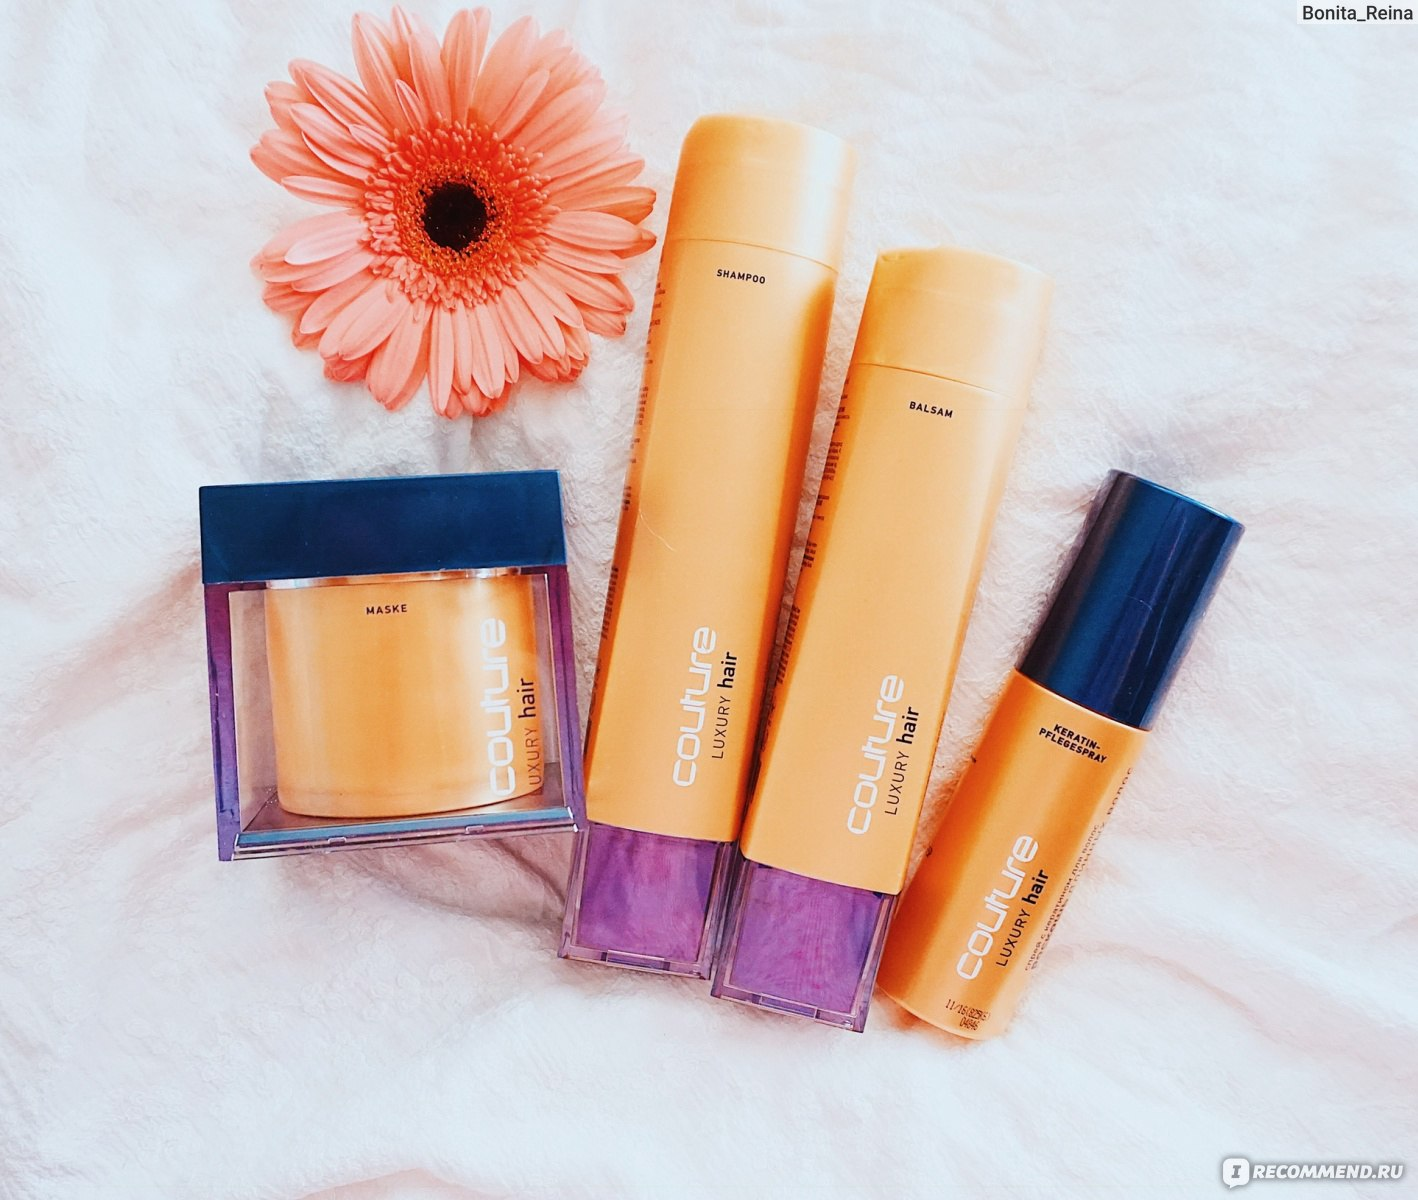 Estel tint balsam: a good quality hair care product 35